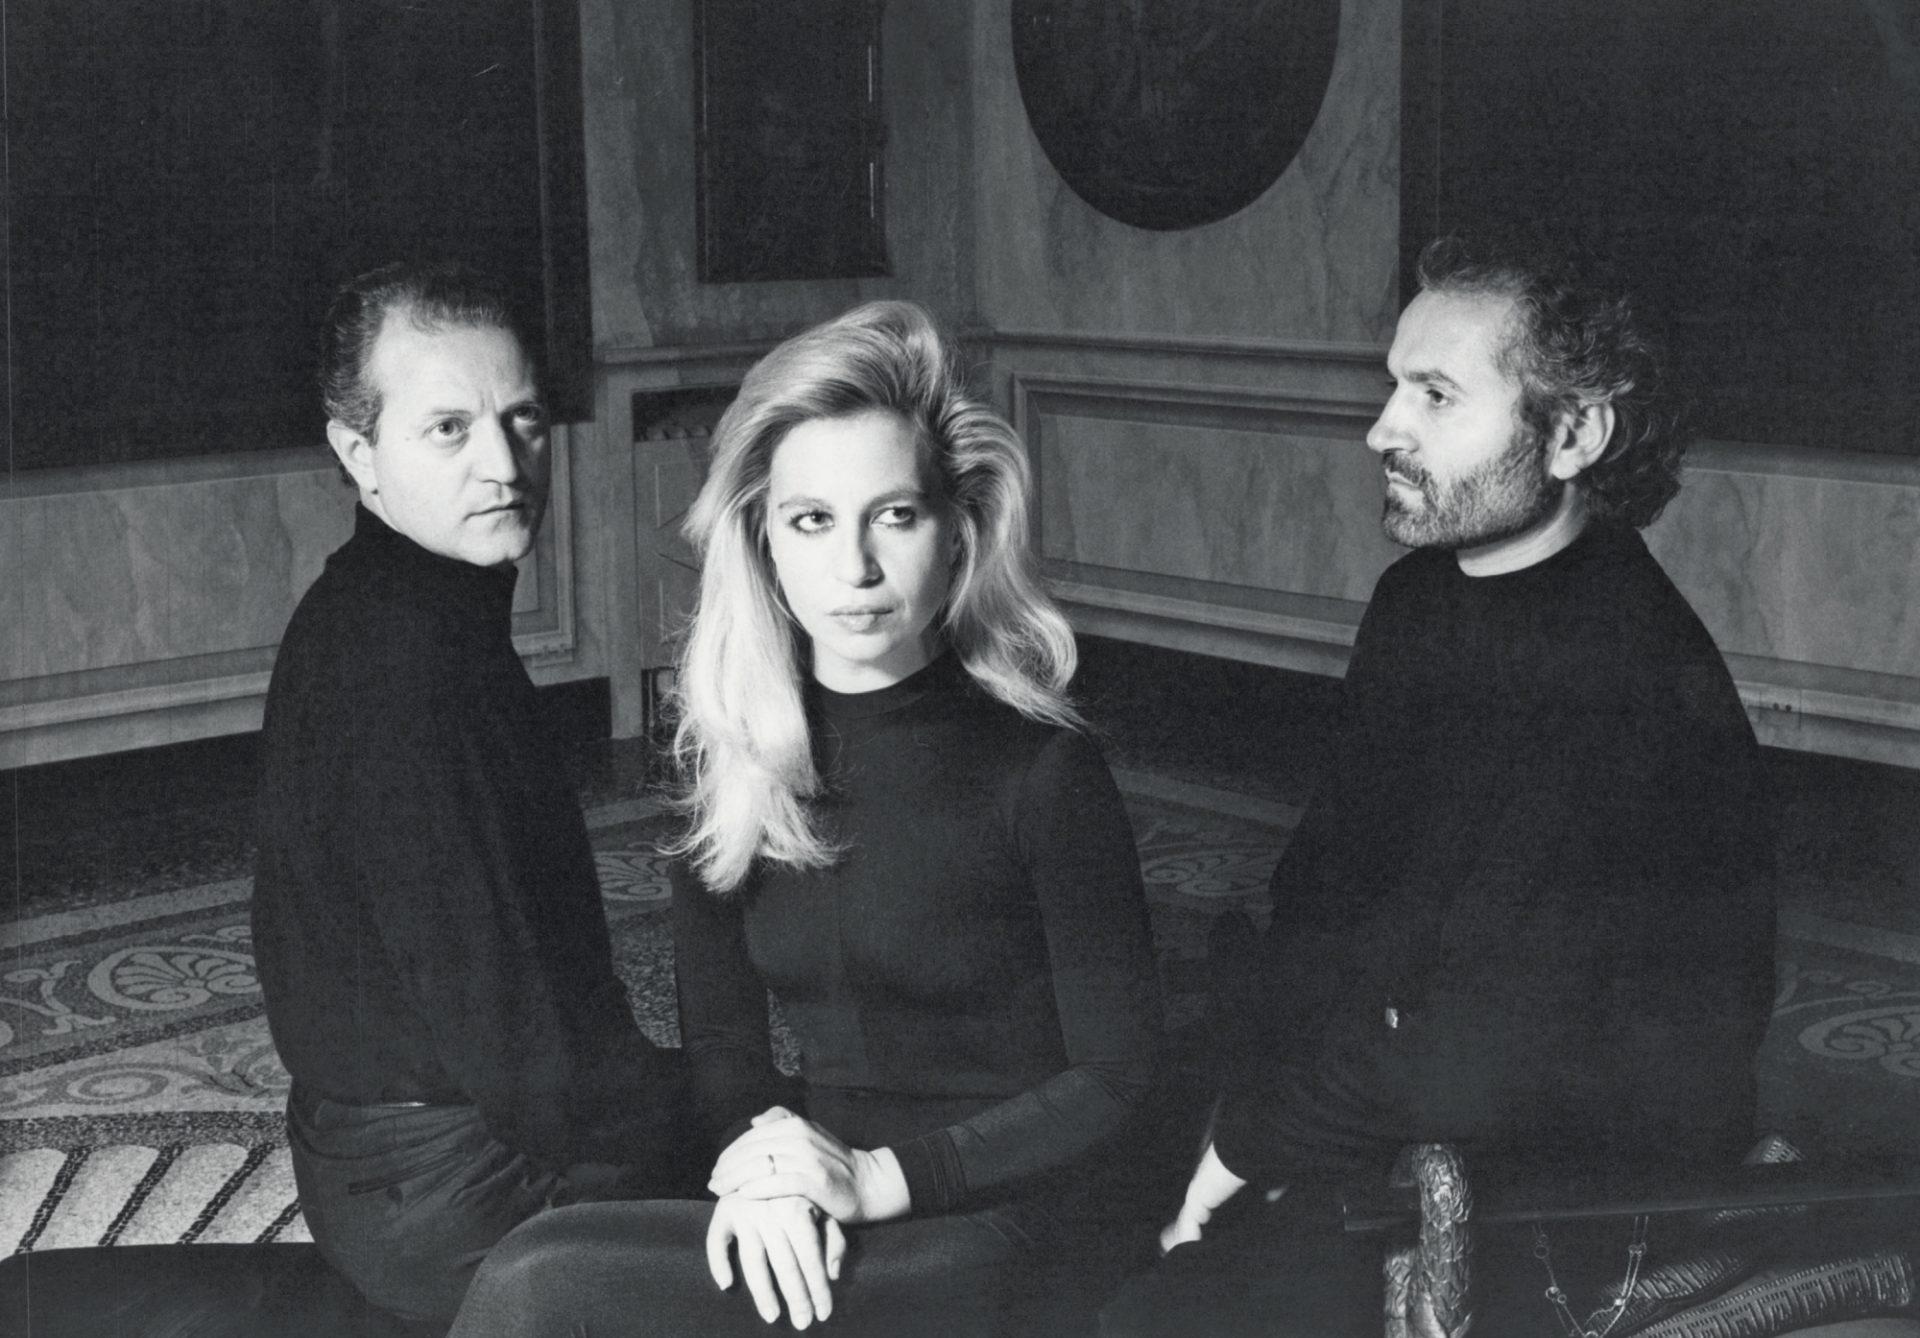 Young Santo, Donatello and Gianni Versace